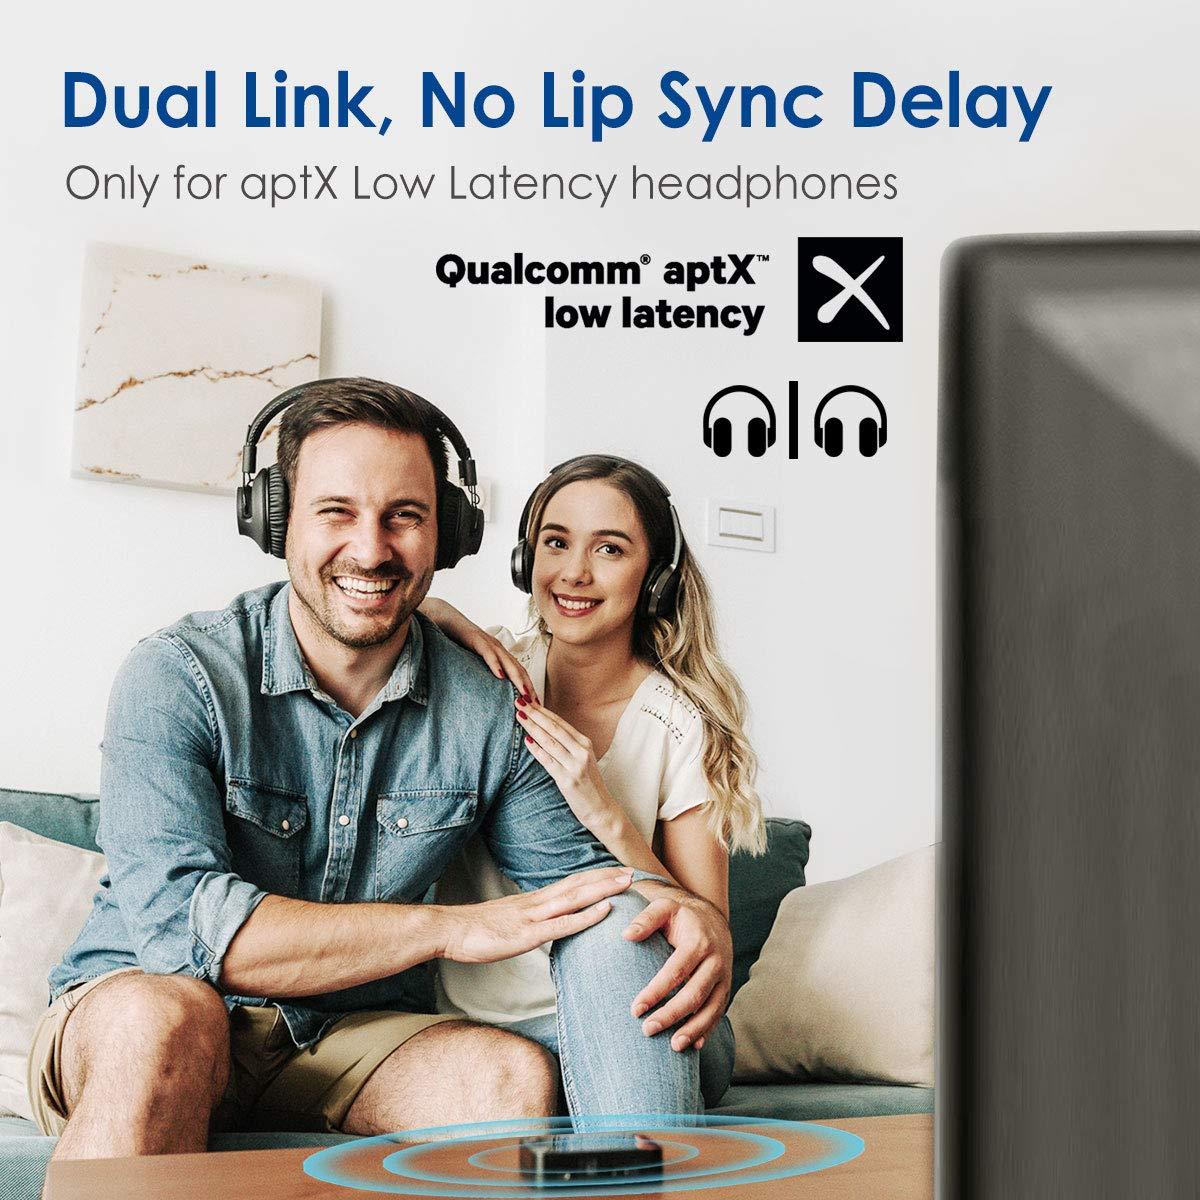 ... baja latencia aptX para 2 auriculares, RCA, adaptador de audio emisor inalámbrico de 3,5 mm, indicadores LED: Amazon.es: Electrónica